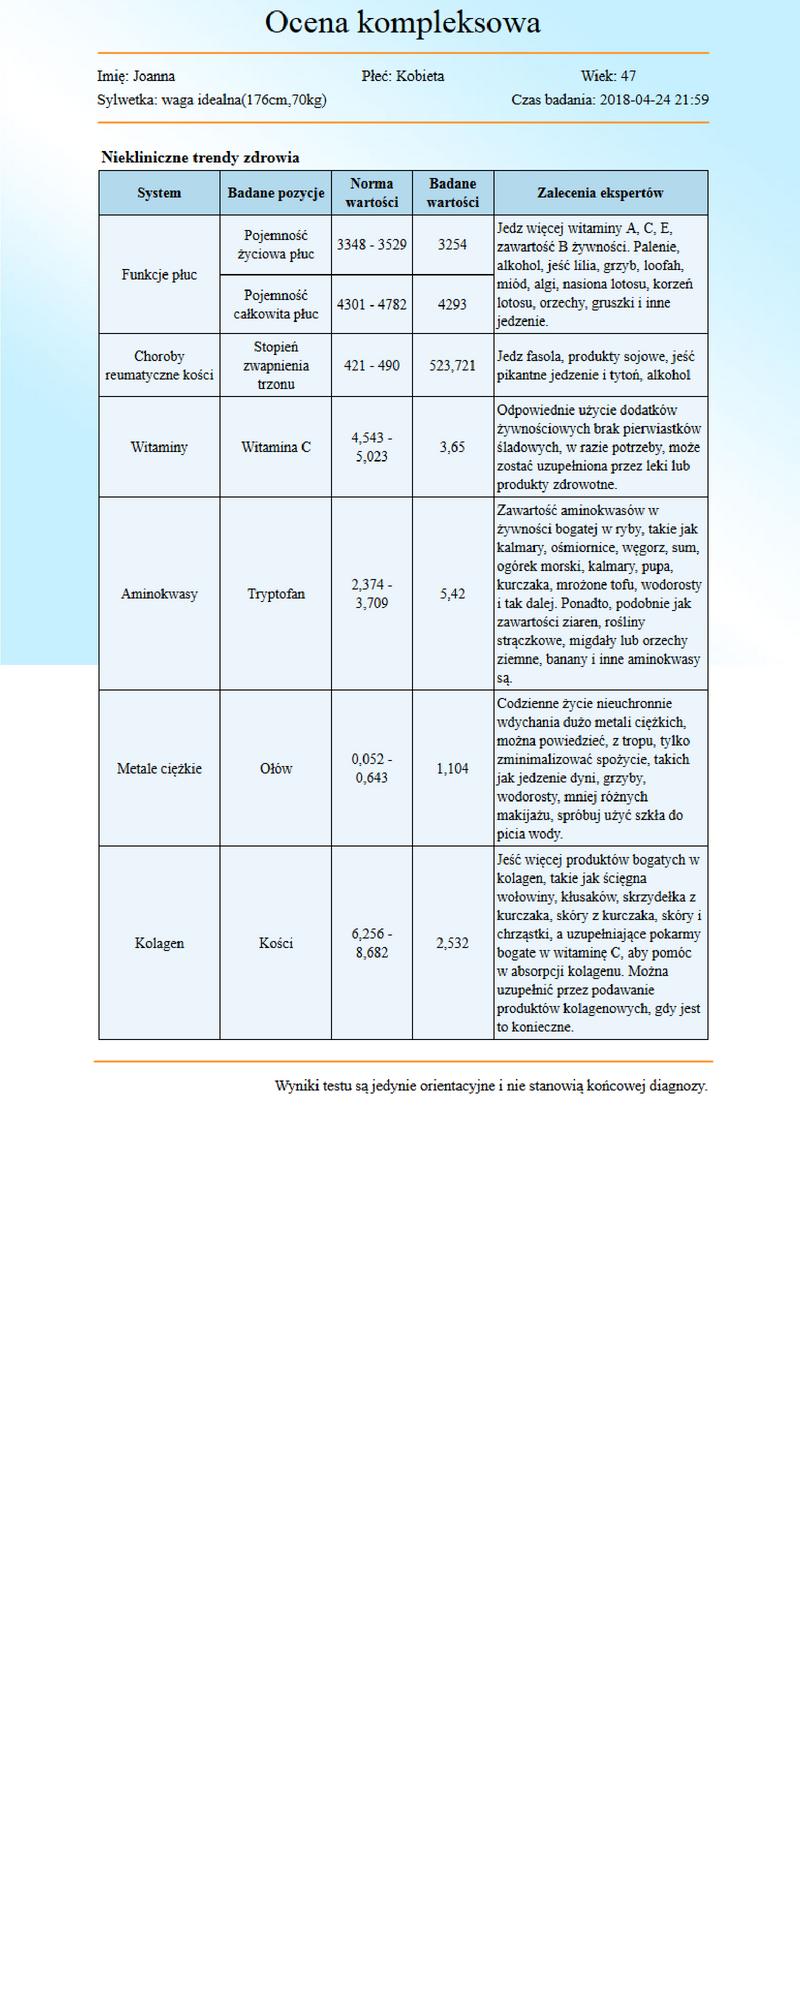 Ocena kompleksowa analiza m